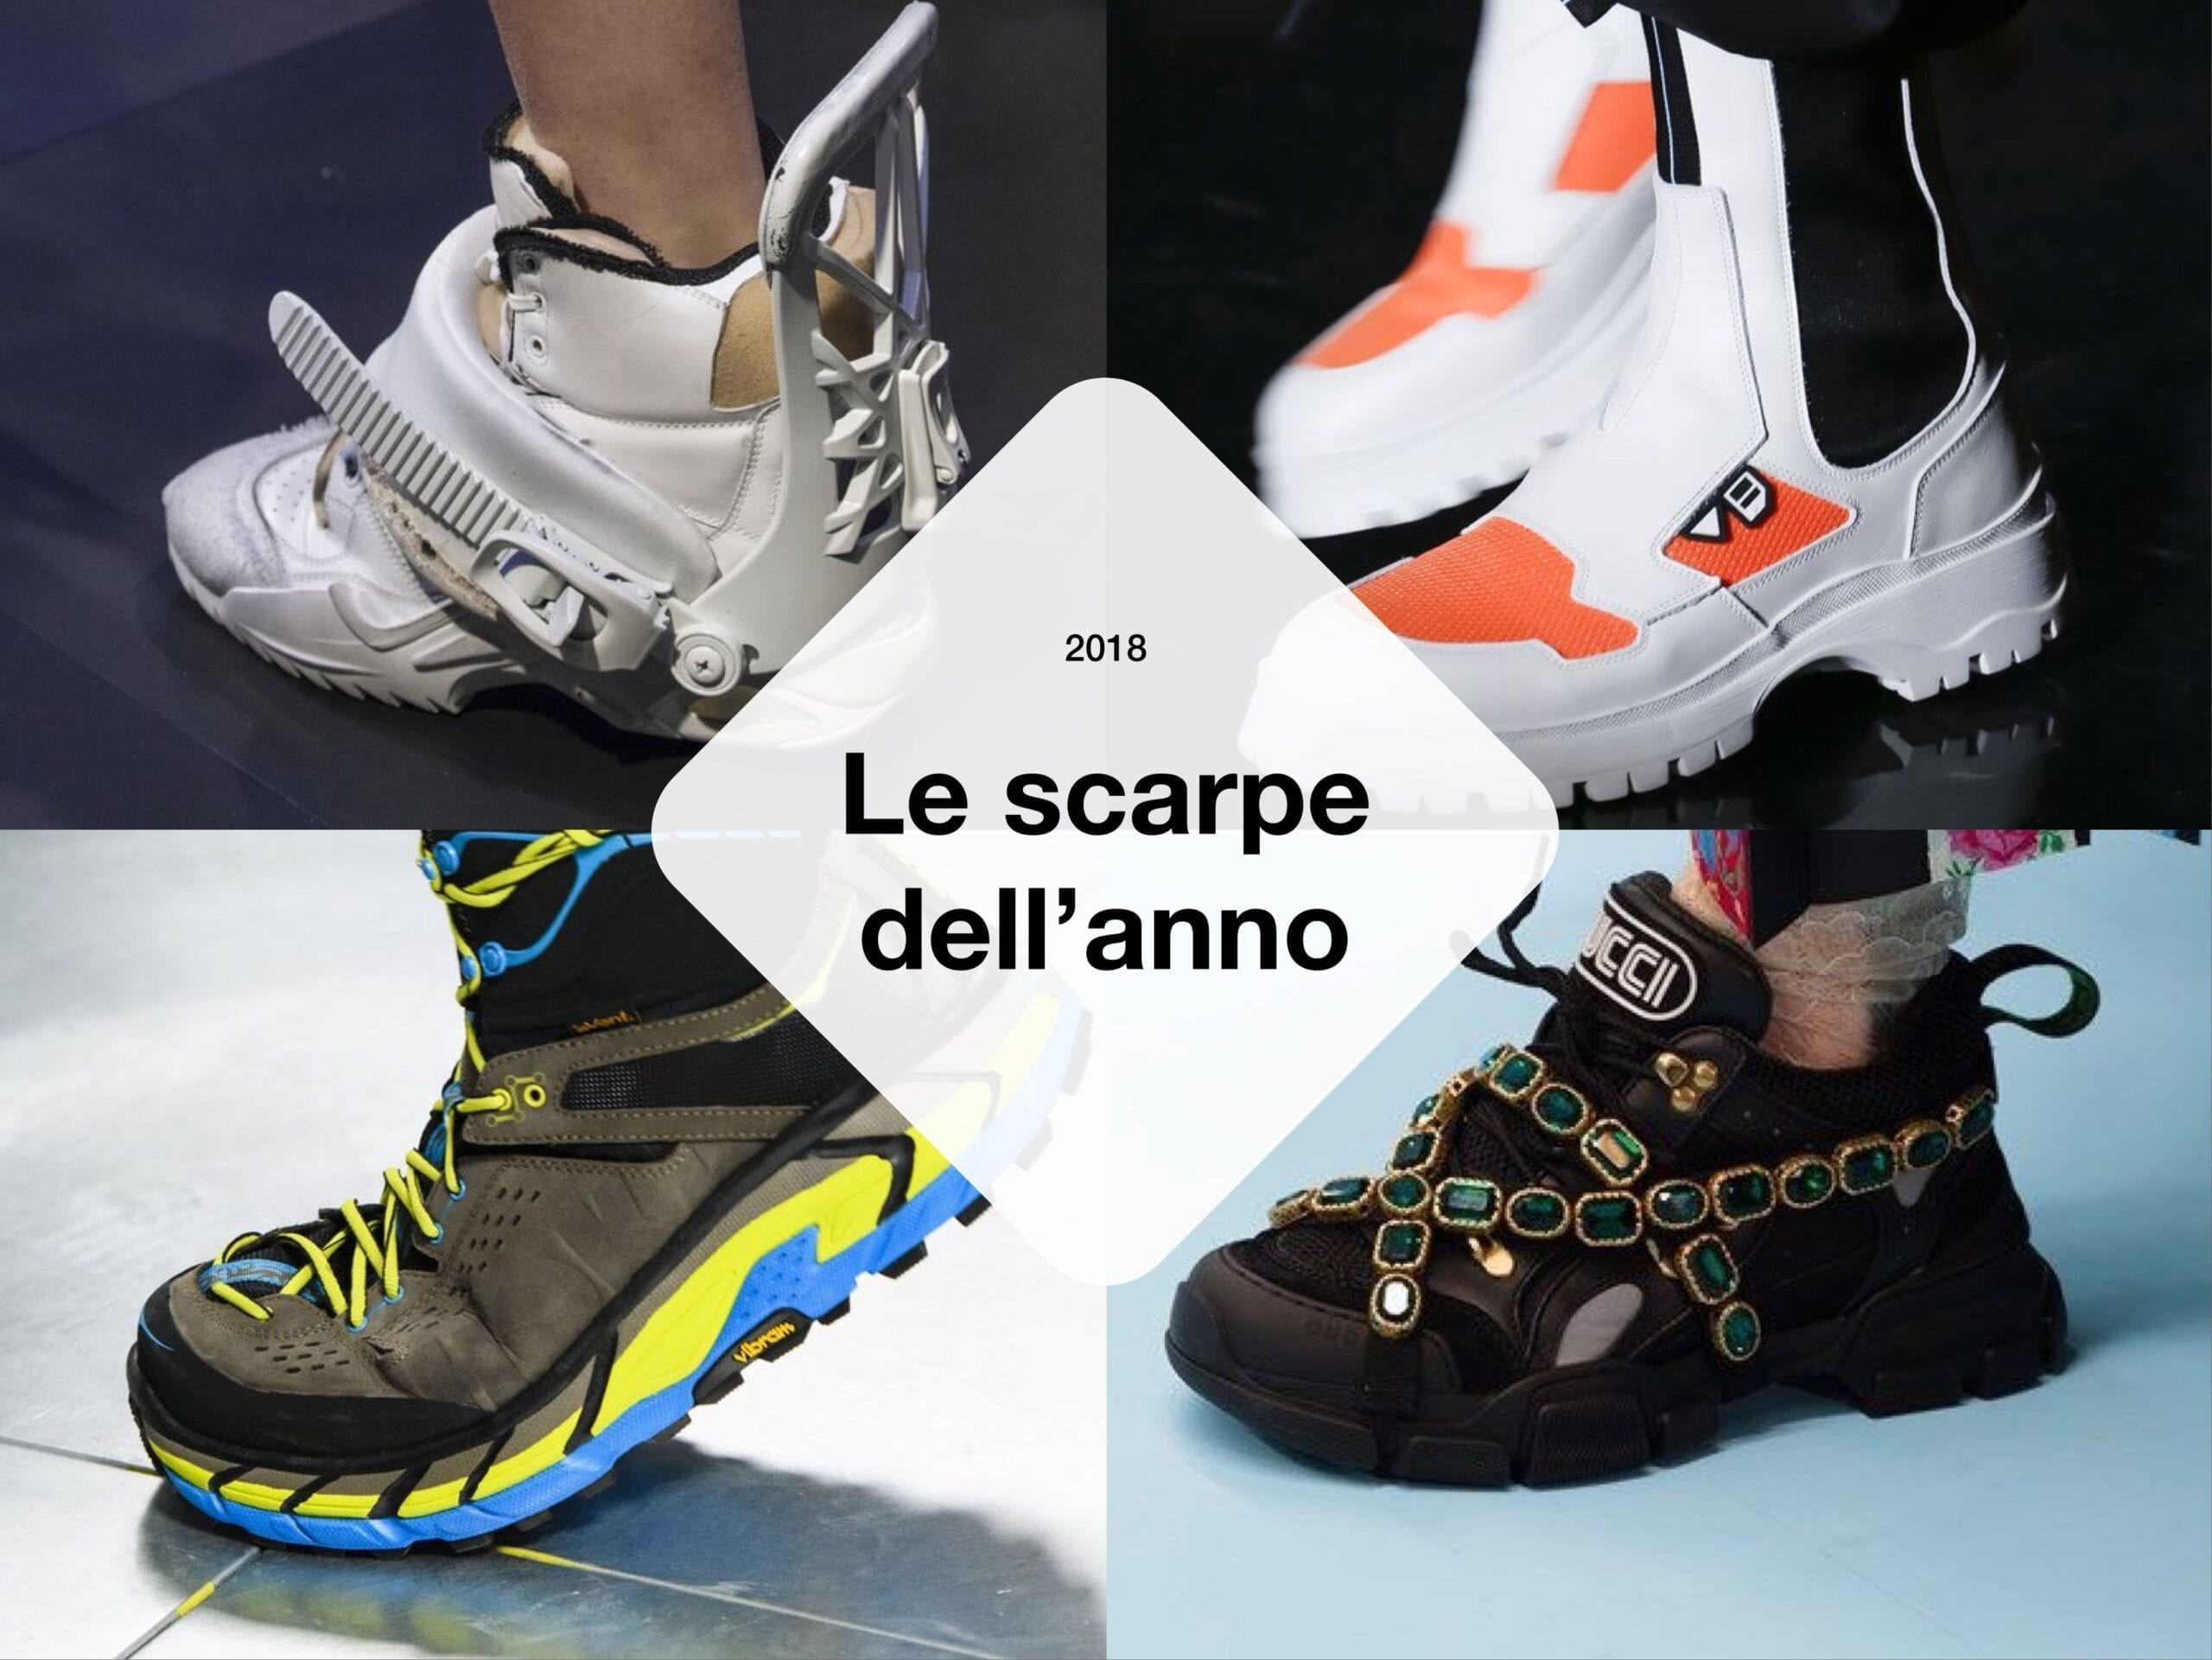 Scarpe 2018 di tendenza, sneakers 2018, sneakers moda donna 2018, theladycracy.it, elisa bellino, blogger moda 2018, fashion blogger italiane 2018